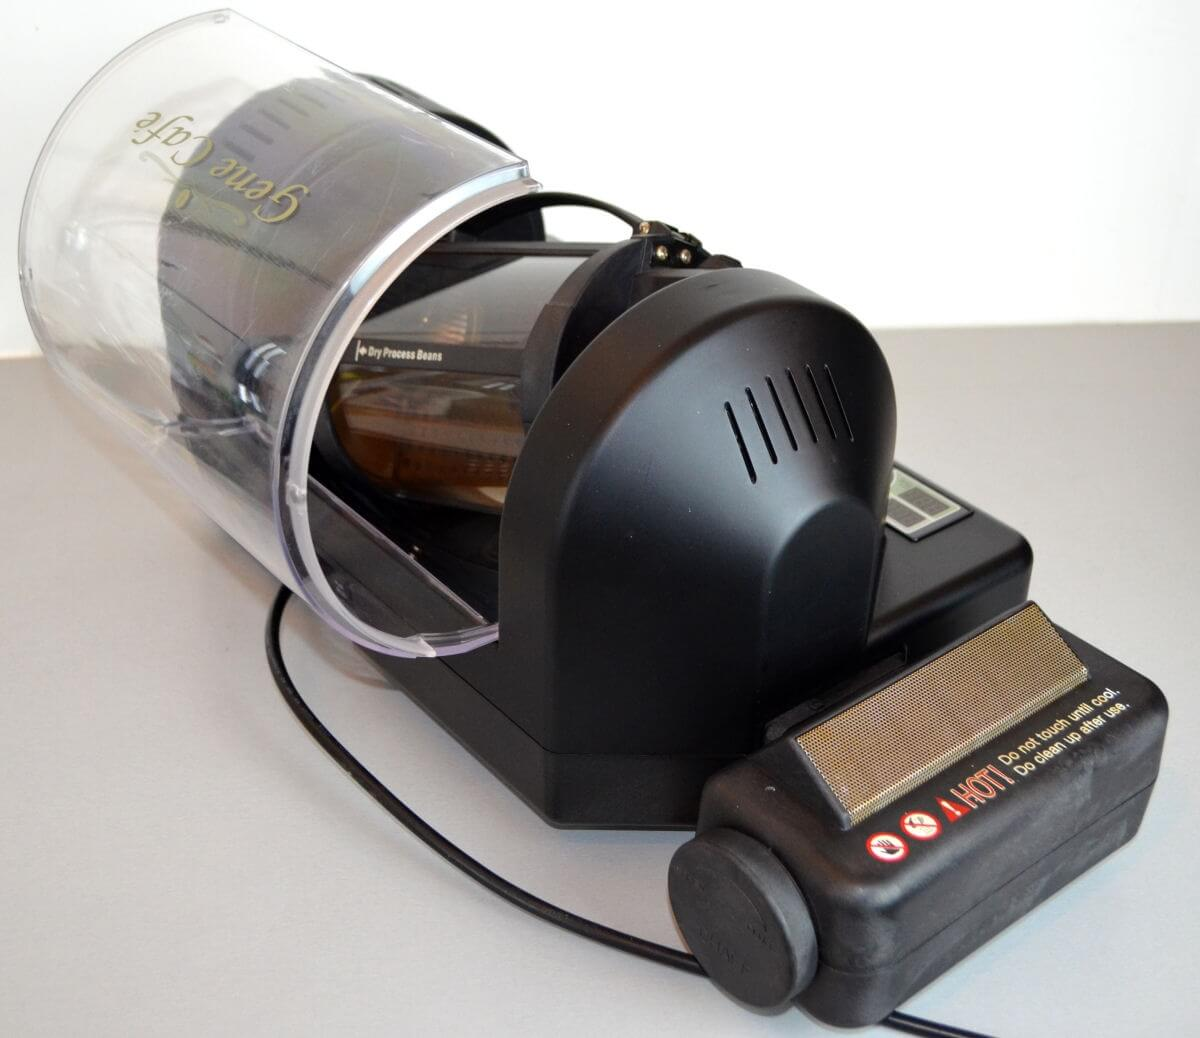 genecafe cbr 101 torrefacteur domestique  9